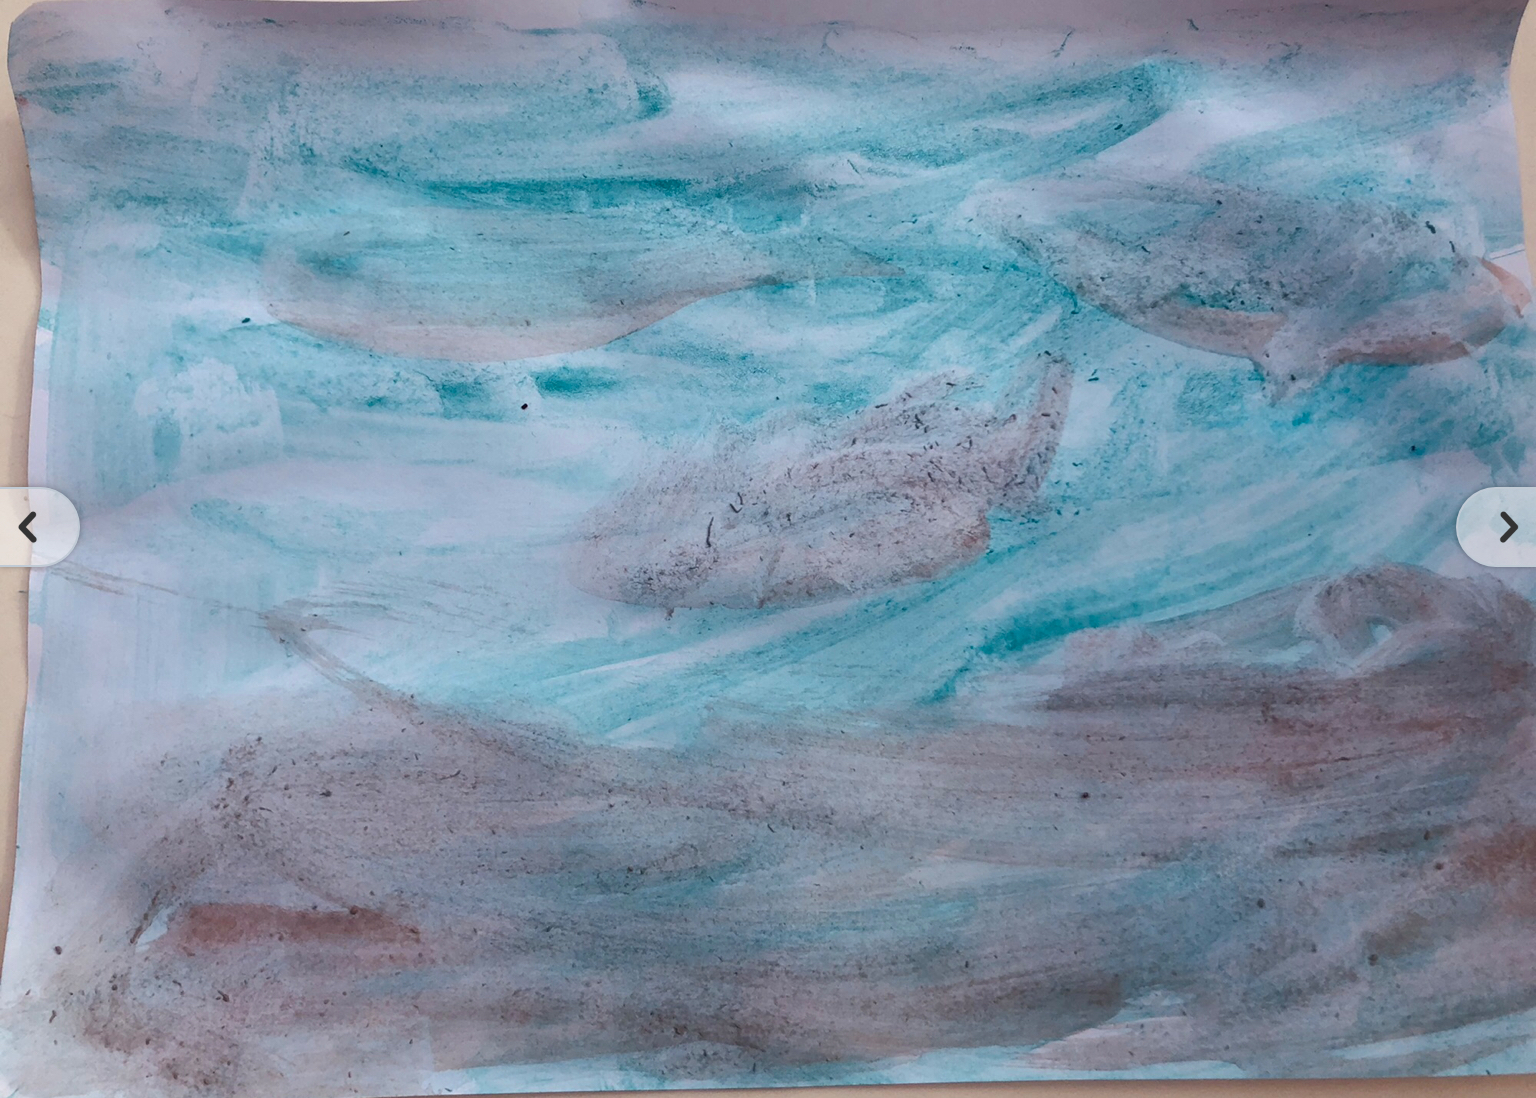 Jude's beautiful abstract Antarctic art!